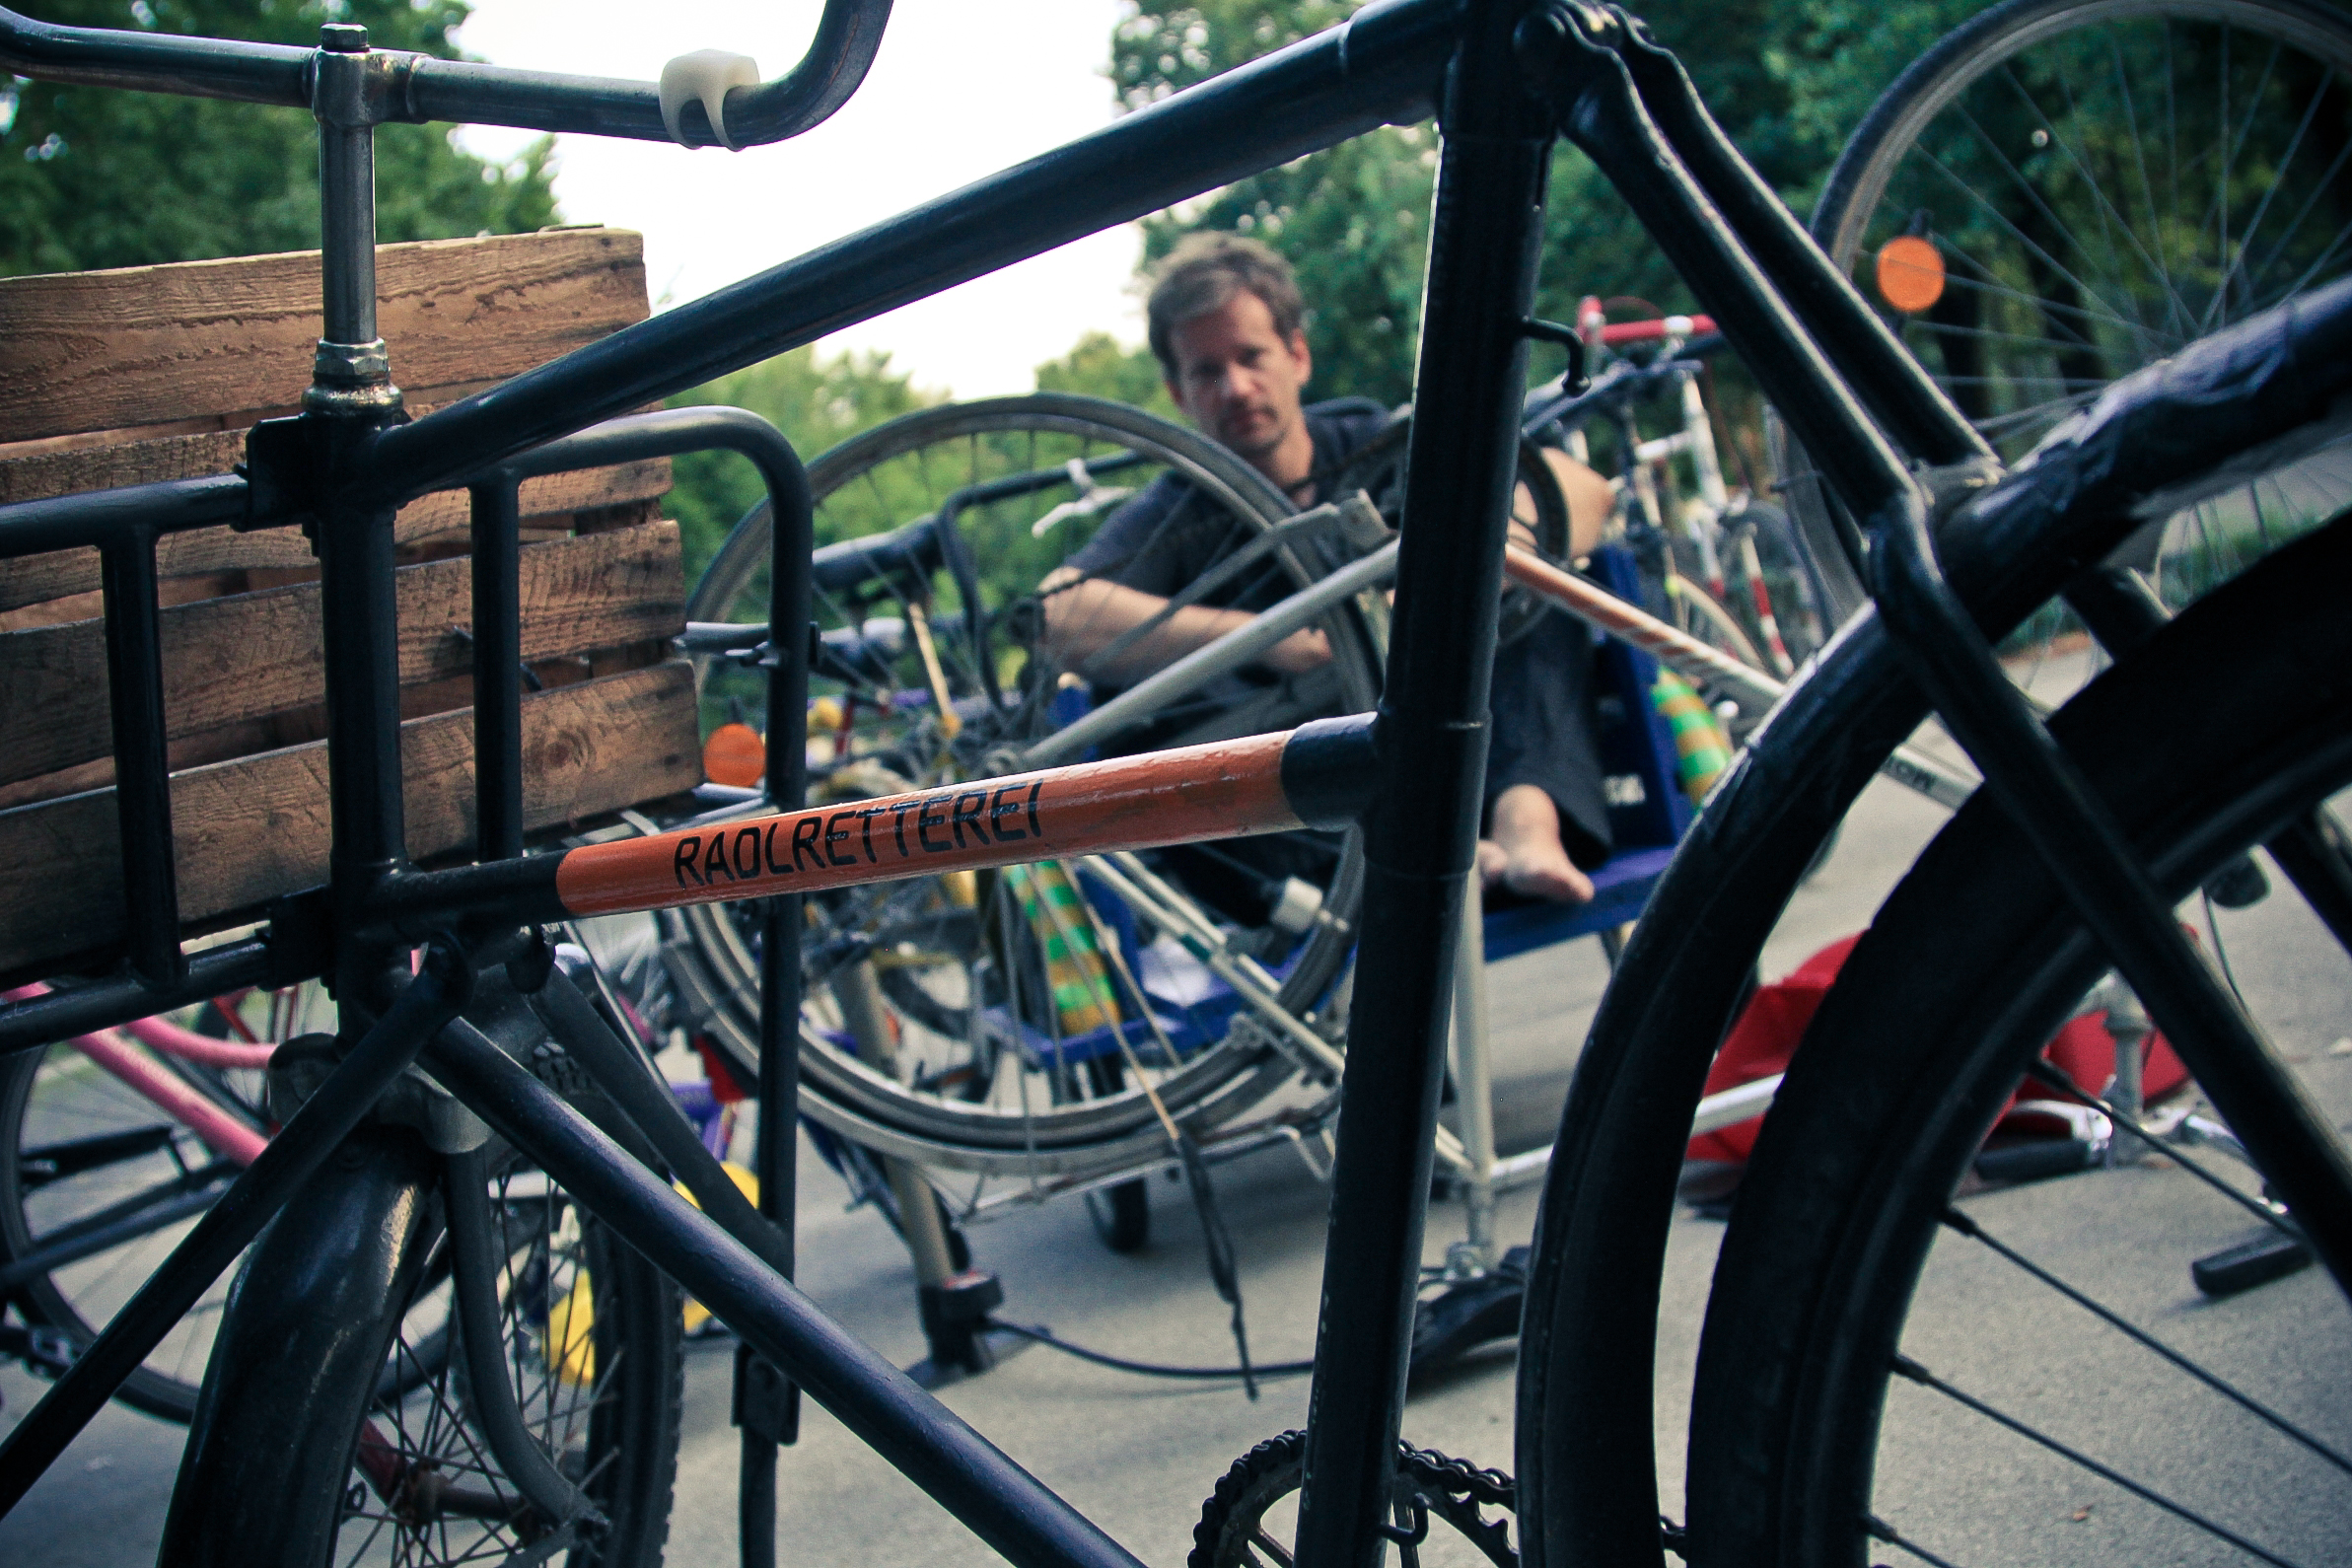 Ein Meister des Upcyclings: Horand. Foto: Radlretterei